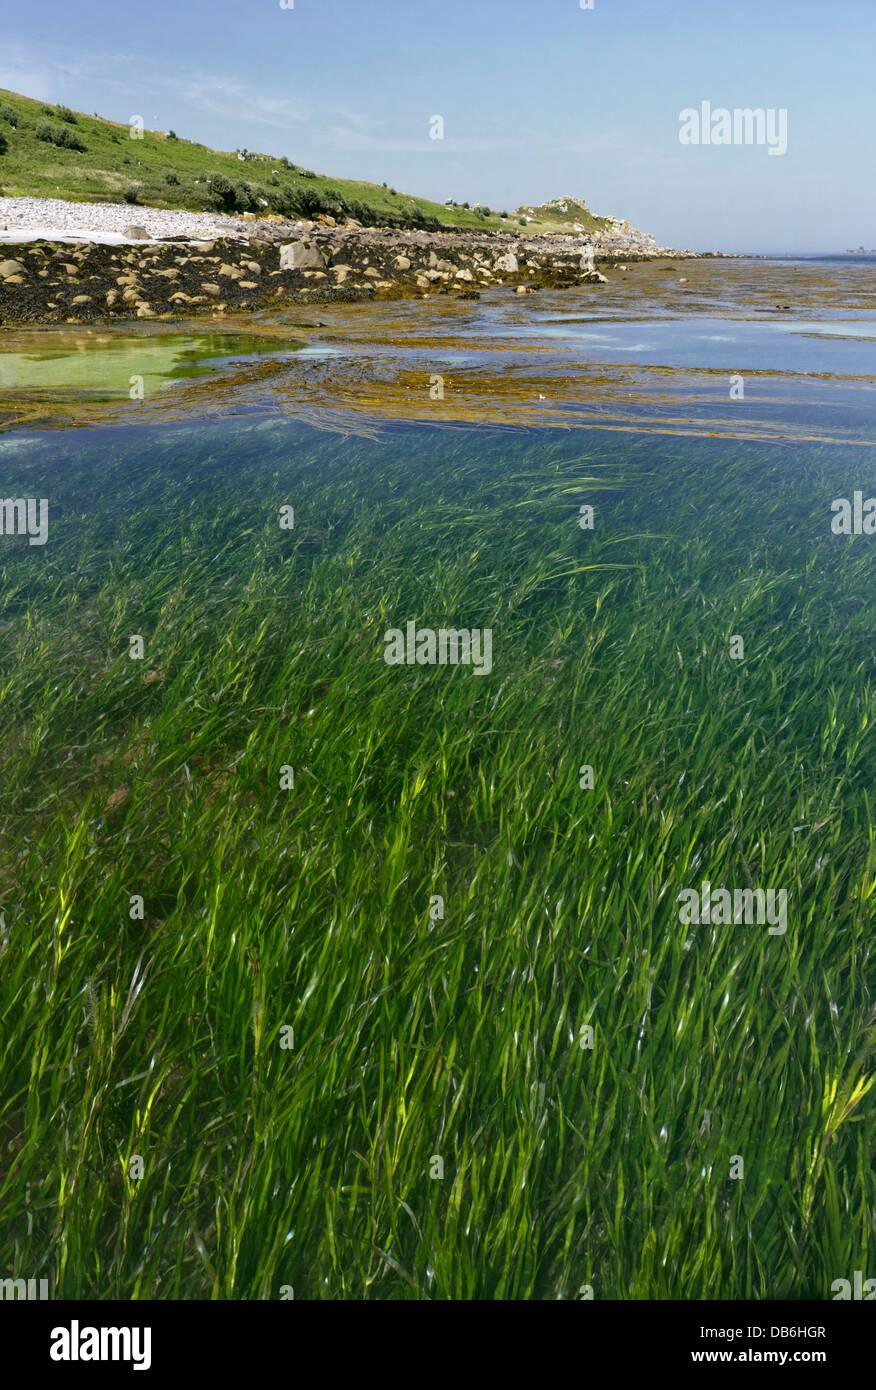 Eelgrass - Zostera marina. Letto Eelgrass, off St Helen's, Isole Scilly. Immagini Stock